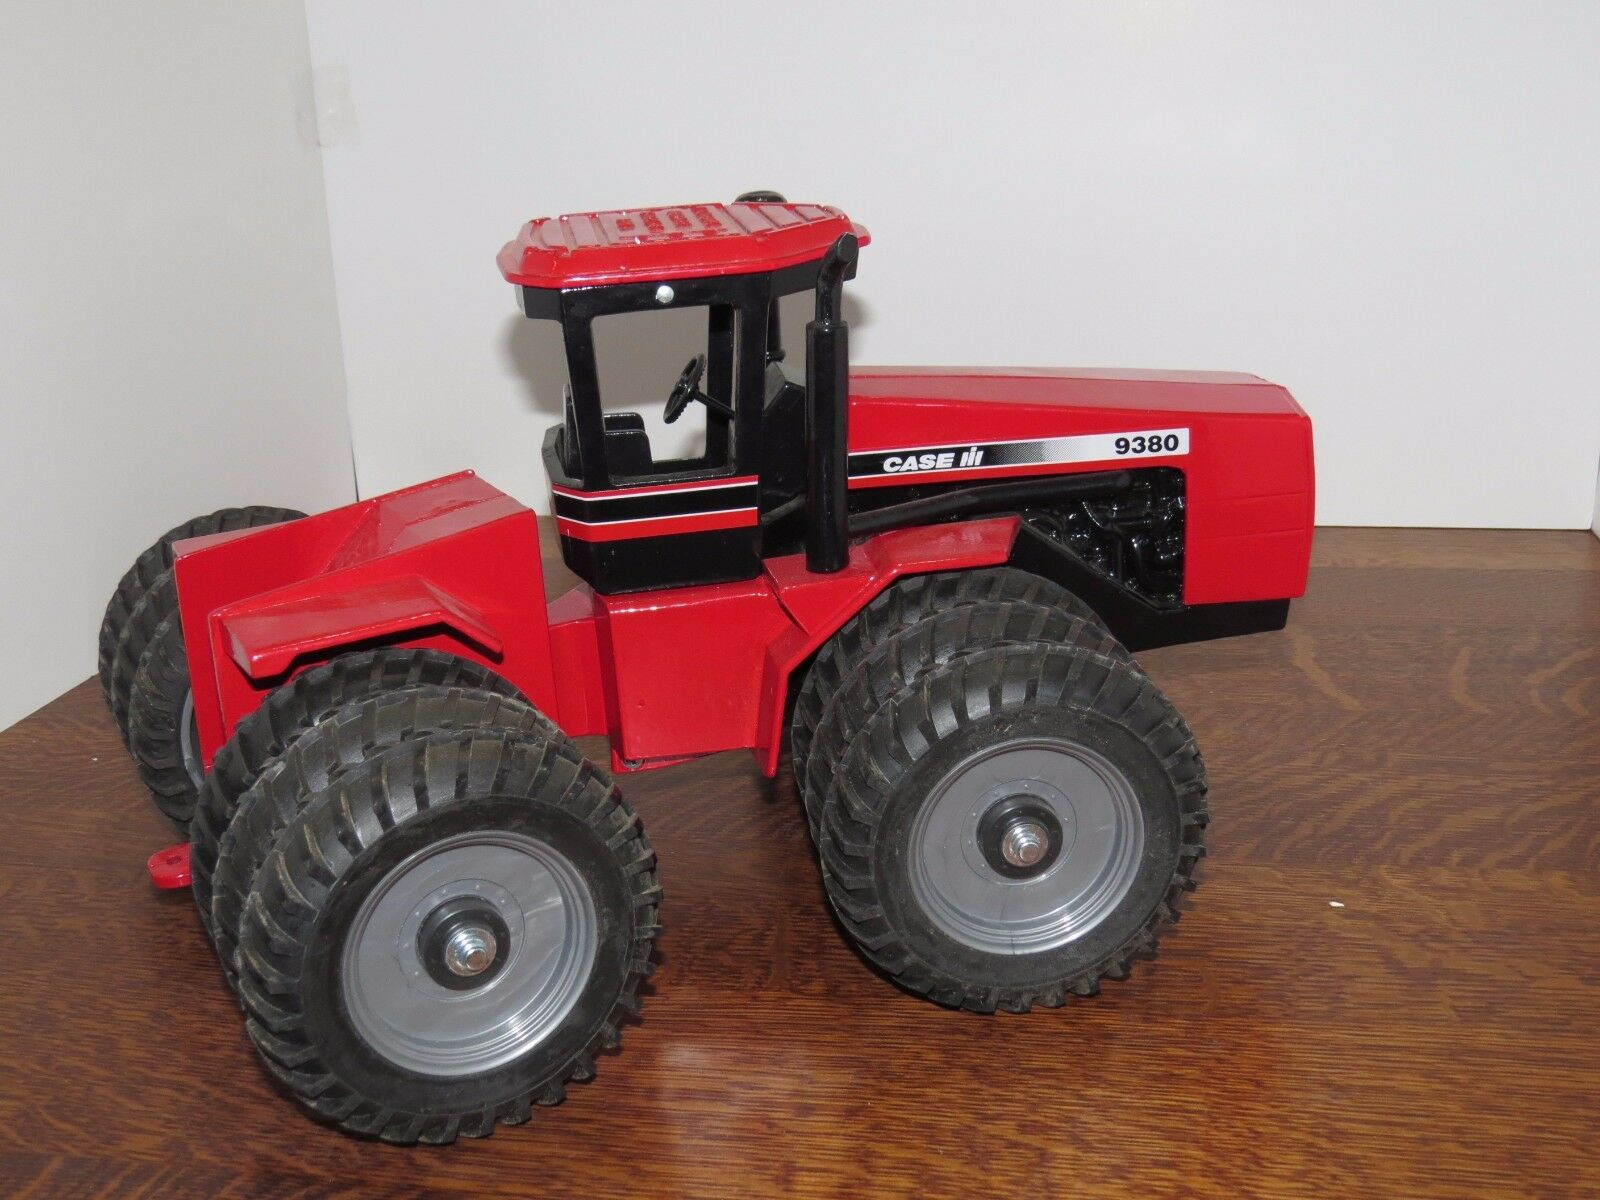 SCALE MODELS 1 16 CASE IH Steiger 9380 Toy Tractor TRIPLES 1995 Fargo nb